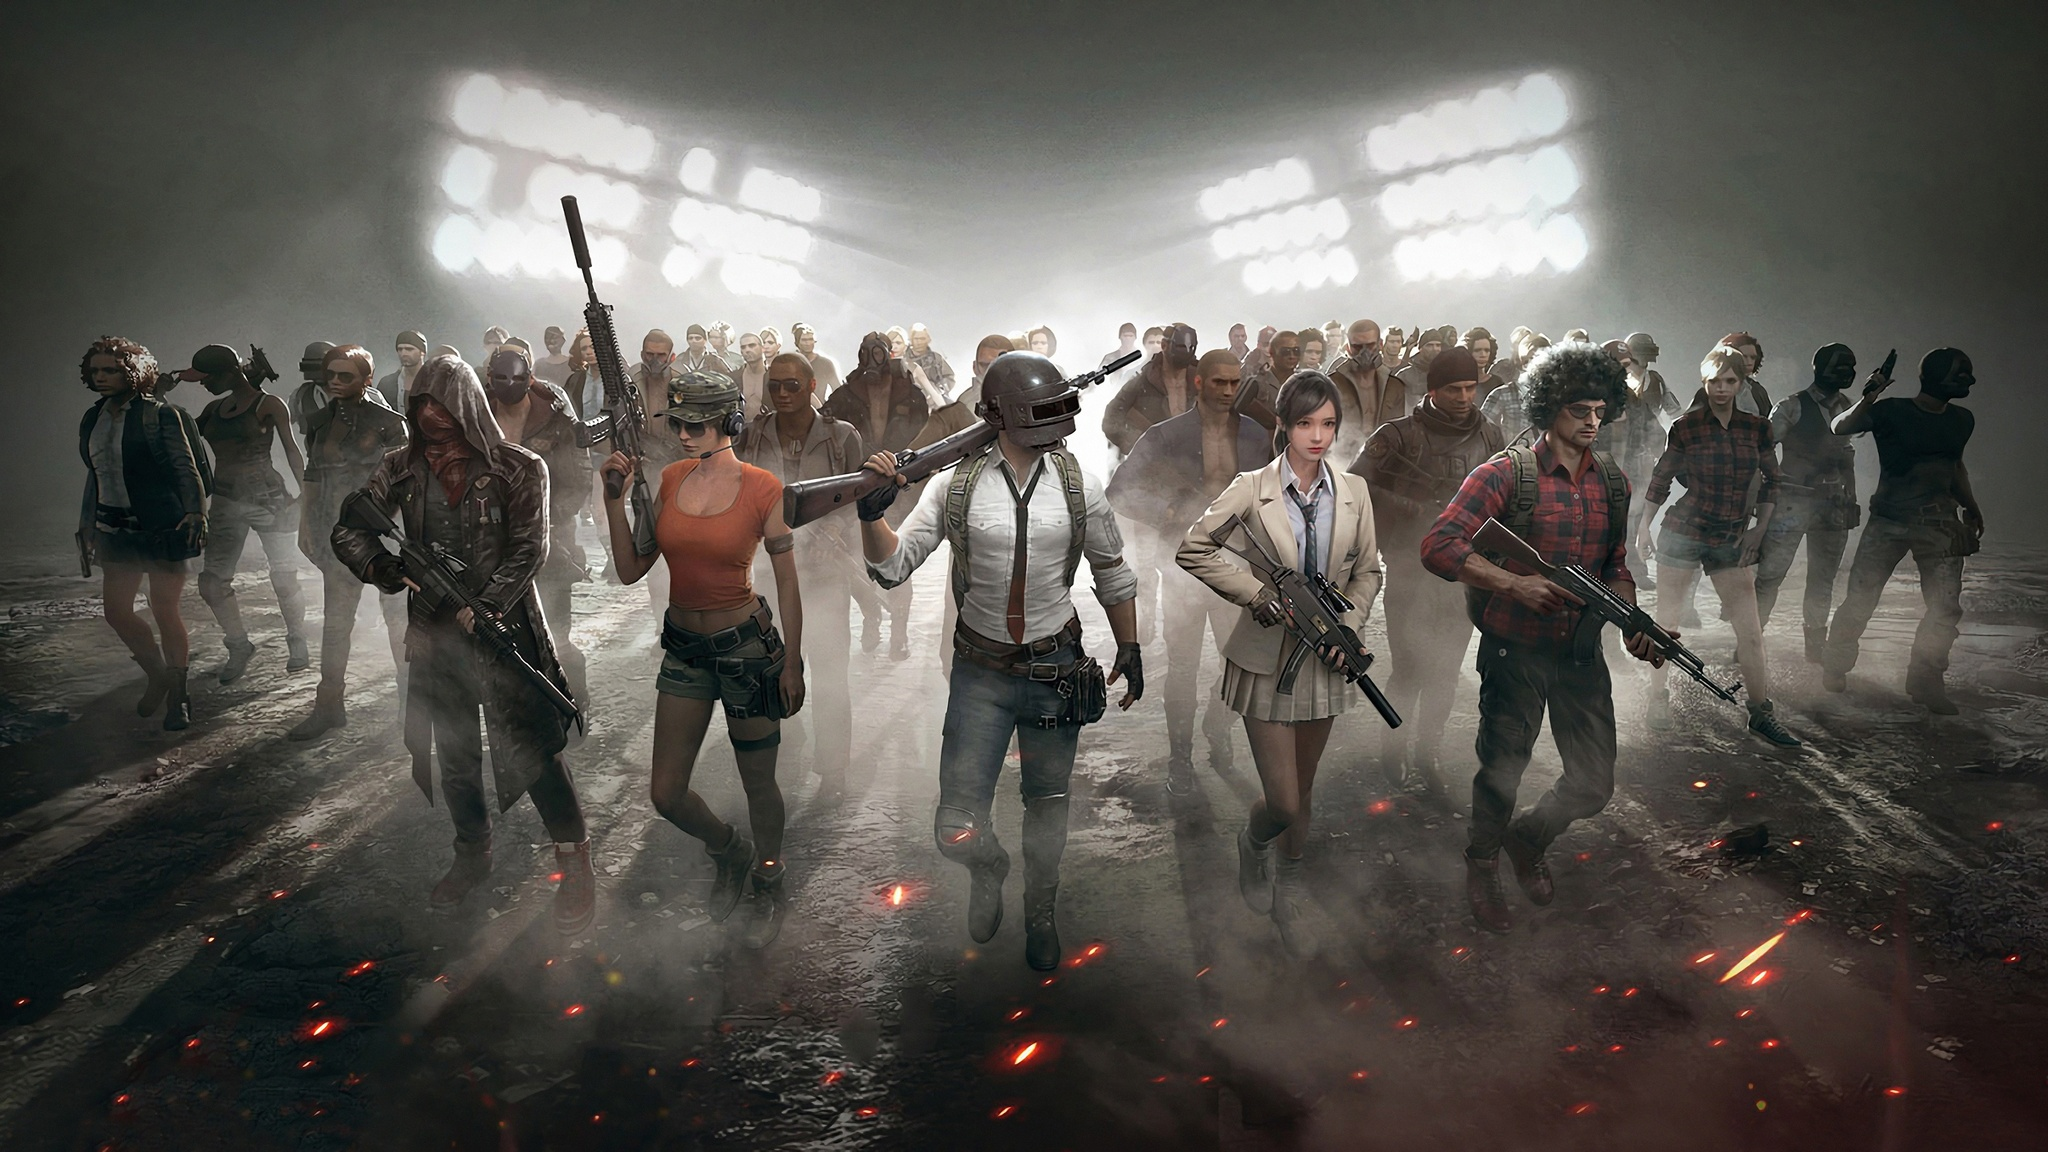 Playerunknowns Battlegrounds Hd Games 4k Wallpapers: 2048x1152 Pubg Characters 4k 2048x1152 Resolution HD 4k